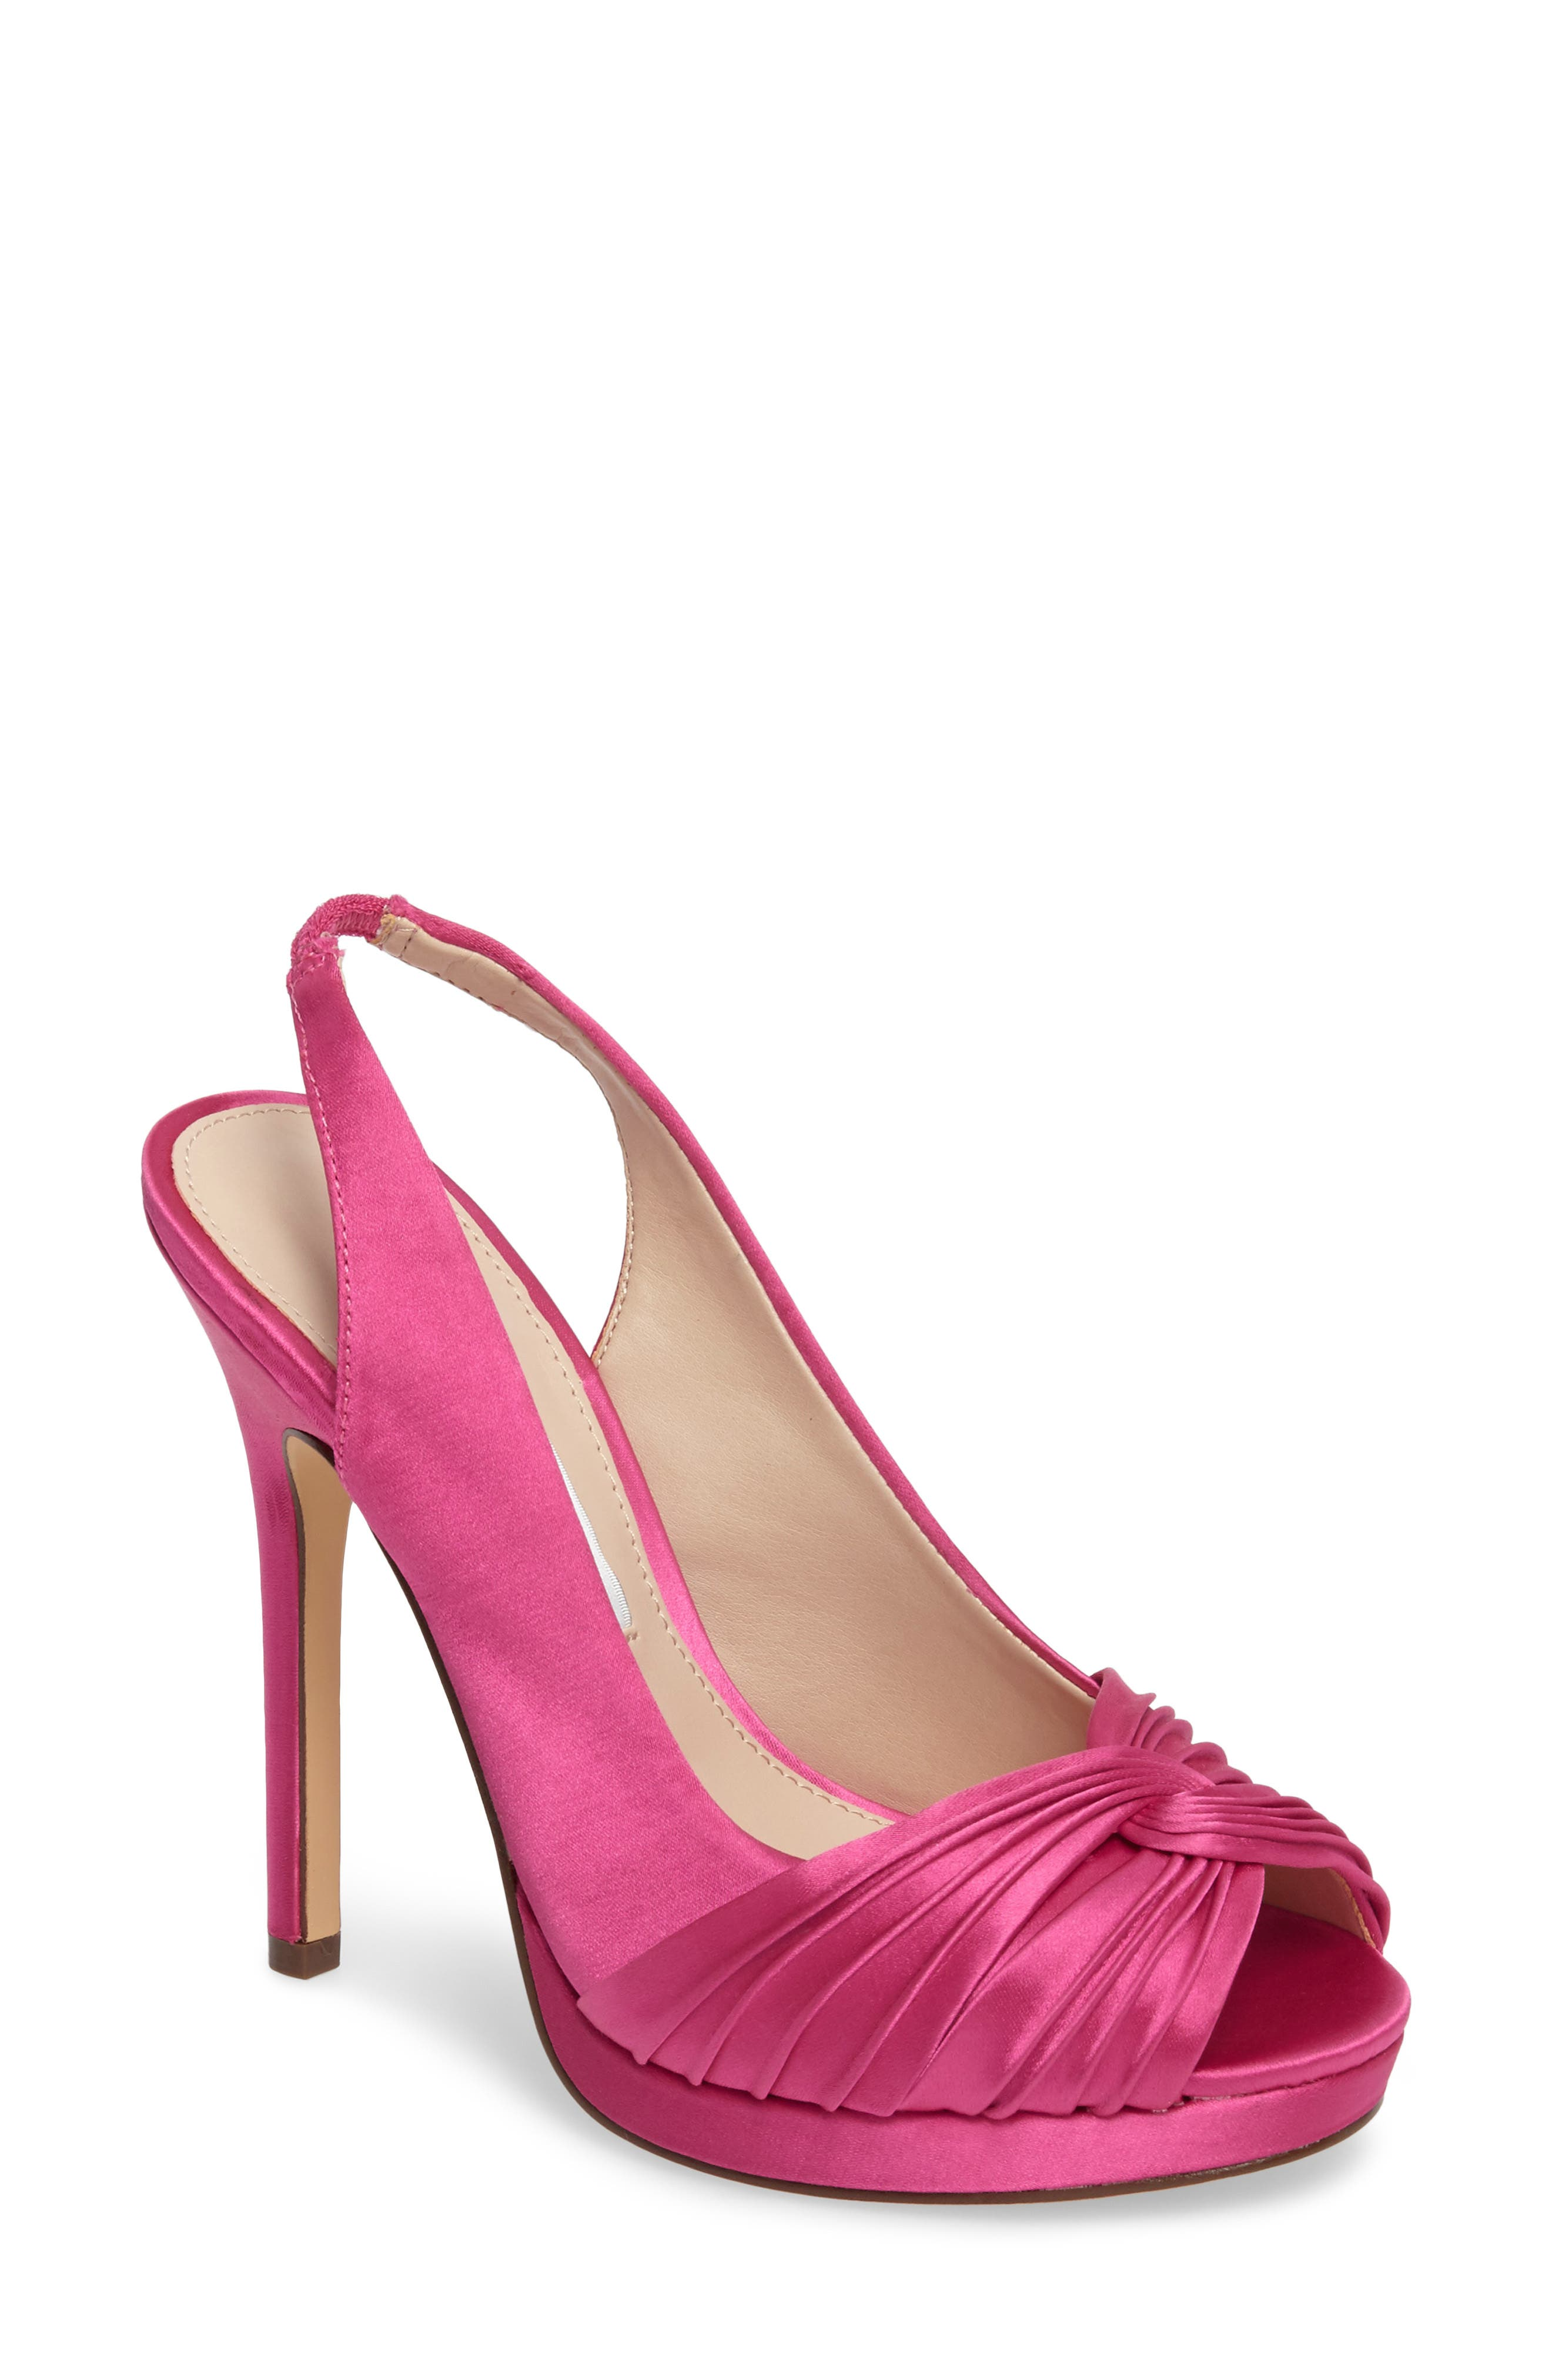 Women's Pink Slingback Pumps   Nordstrom